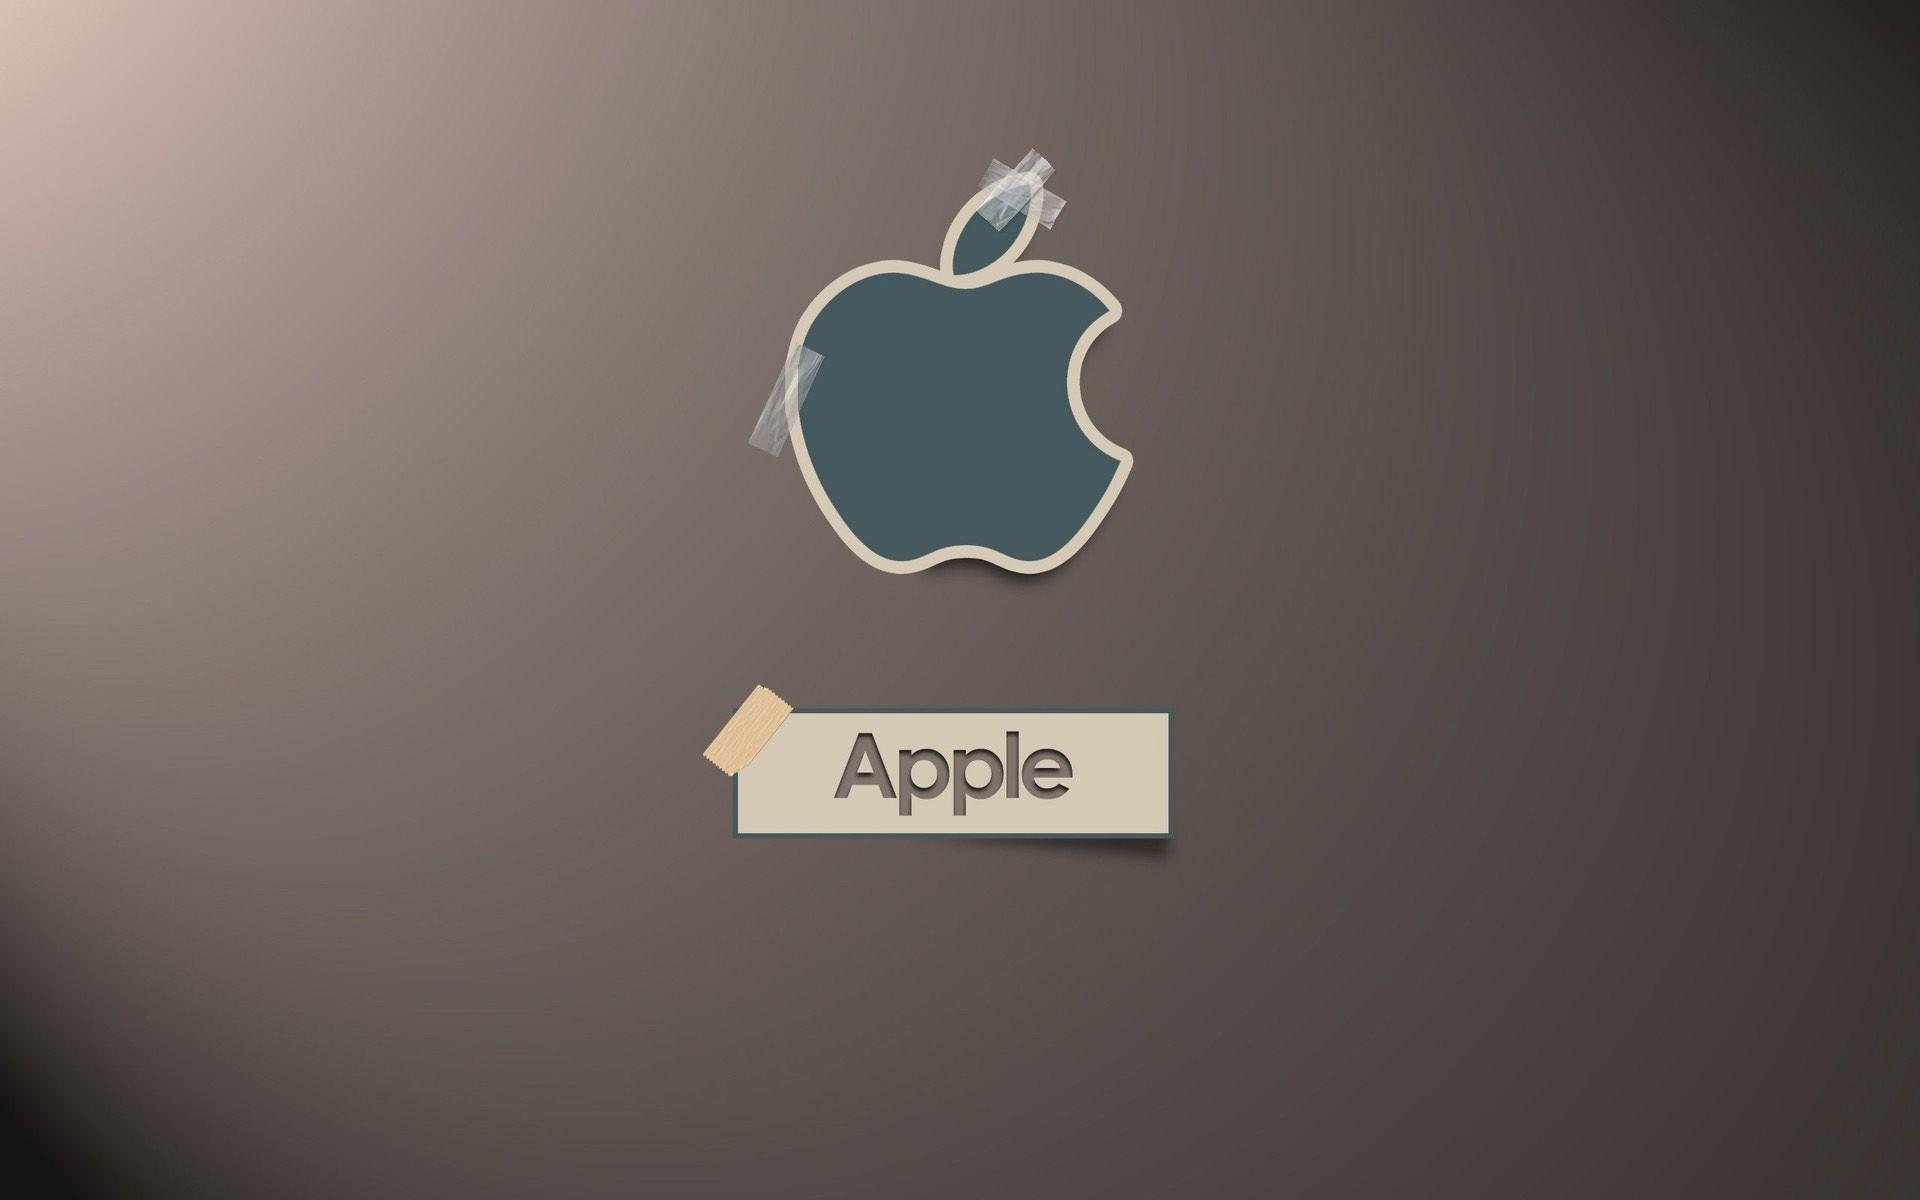 free design background mac download - mac wallpapers hd mac desktop